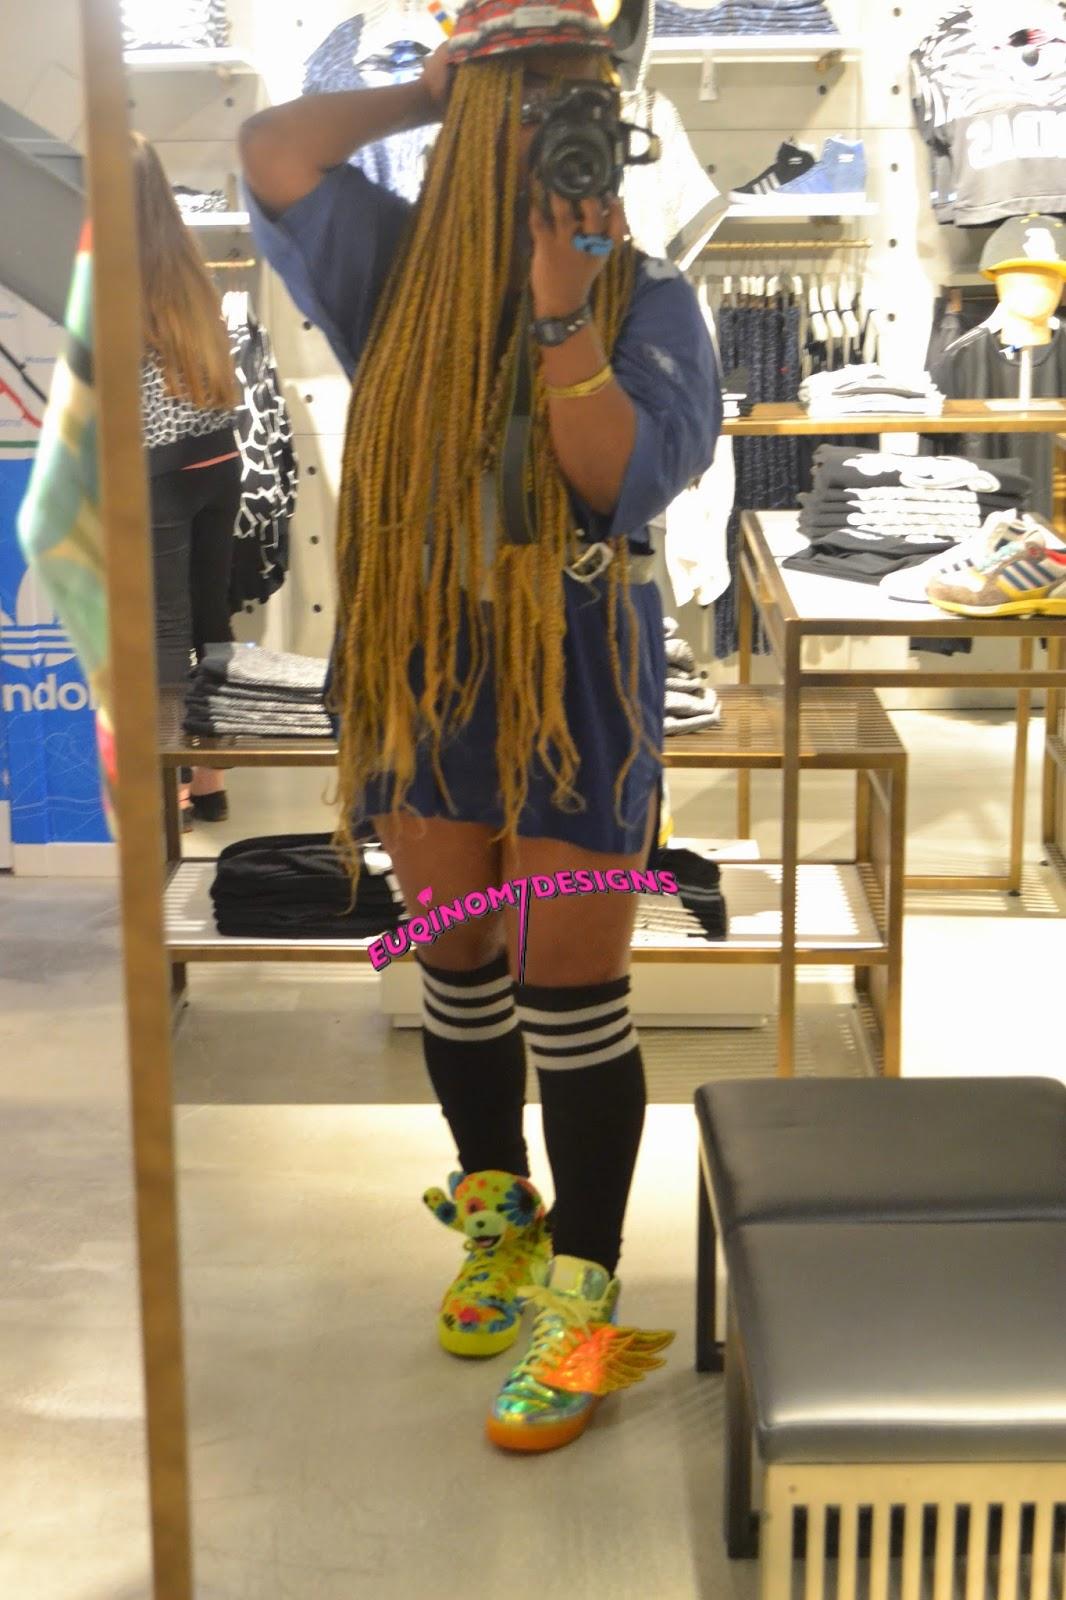 EUQINOM SEVEN: ADI – ME (New Adidas FlagShip Store London)